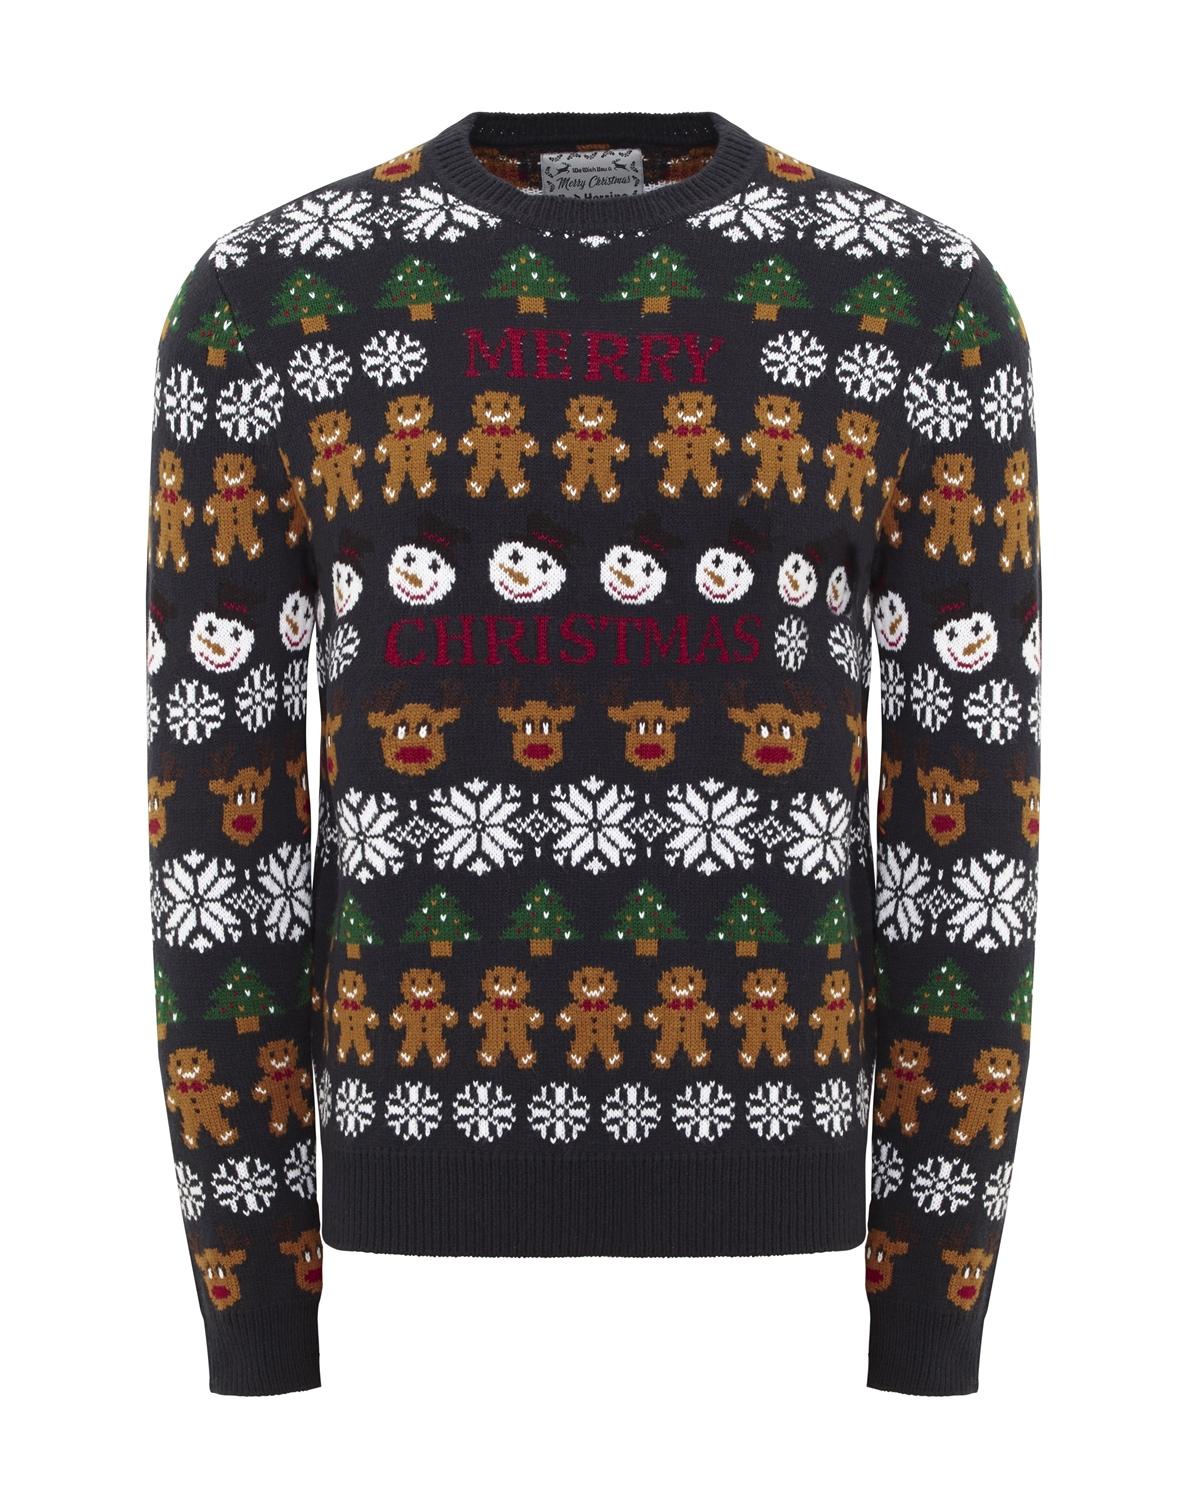 red herring at debenhams christmas jumper reindeer rudolph gingerbread man patterned knit